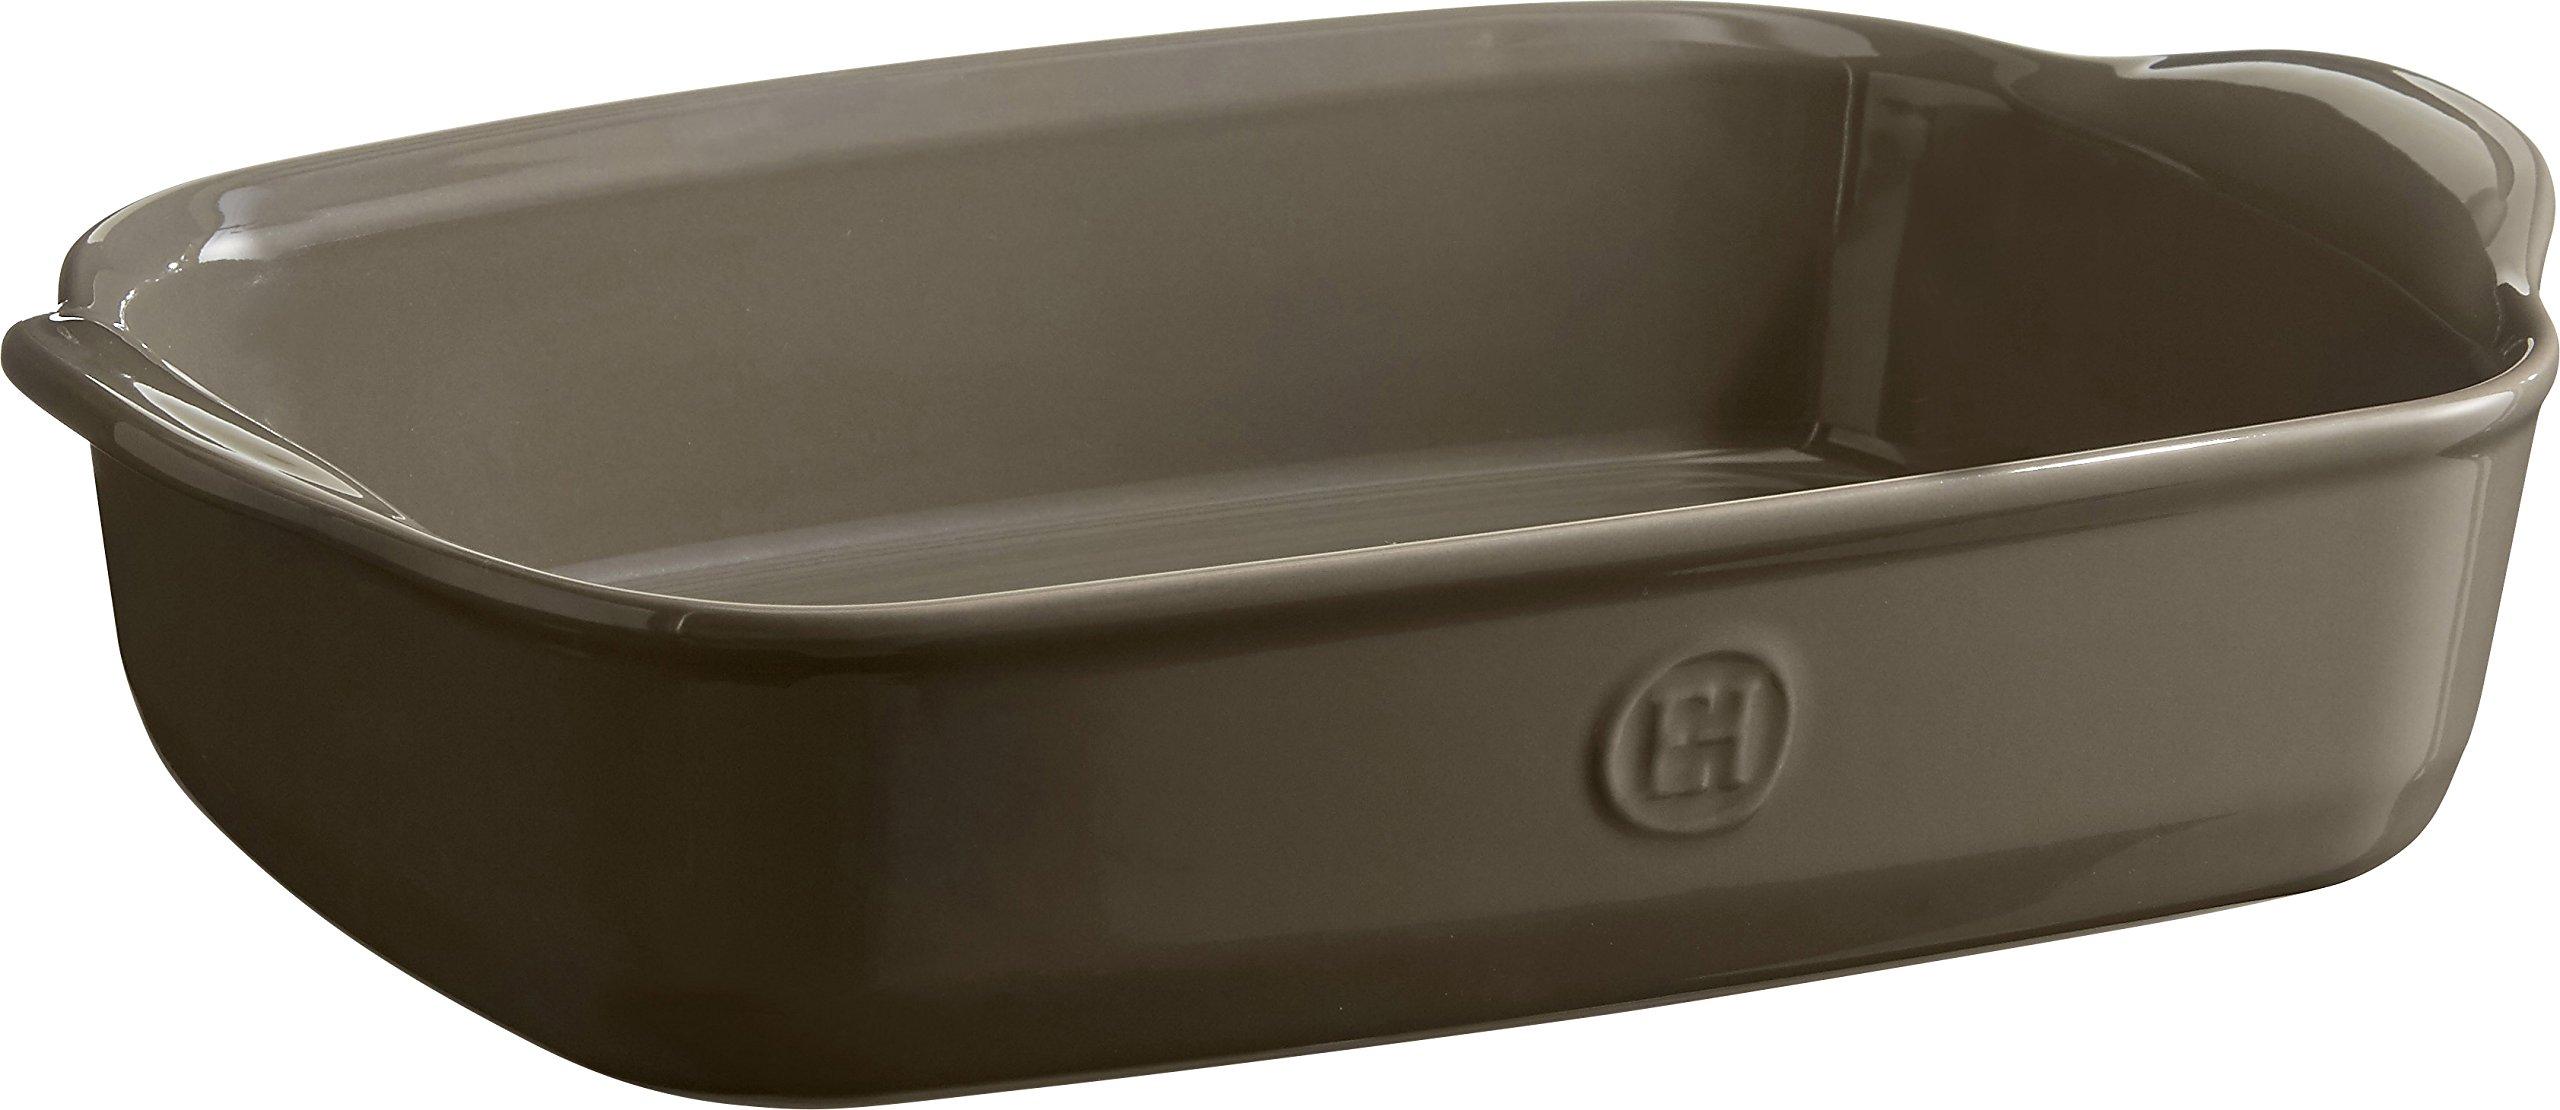 Emile Henry 959650 Ultime Rectangular Baking Dish, 11.4'' x 7.5'', Flint